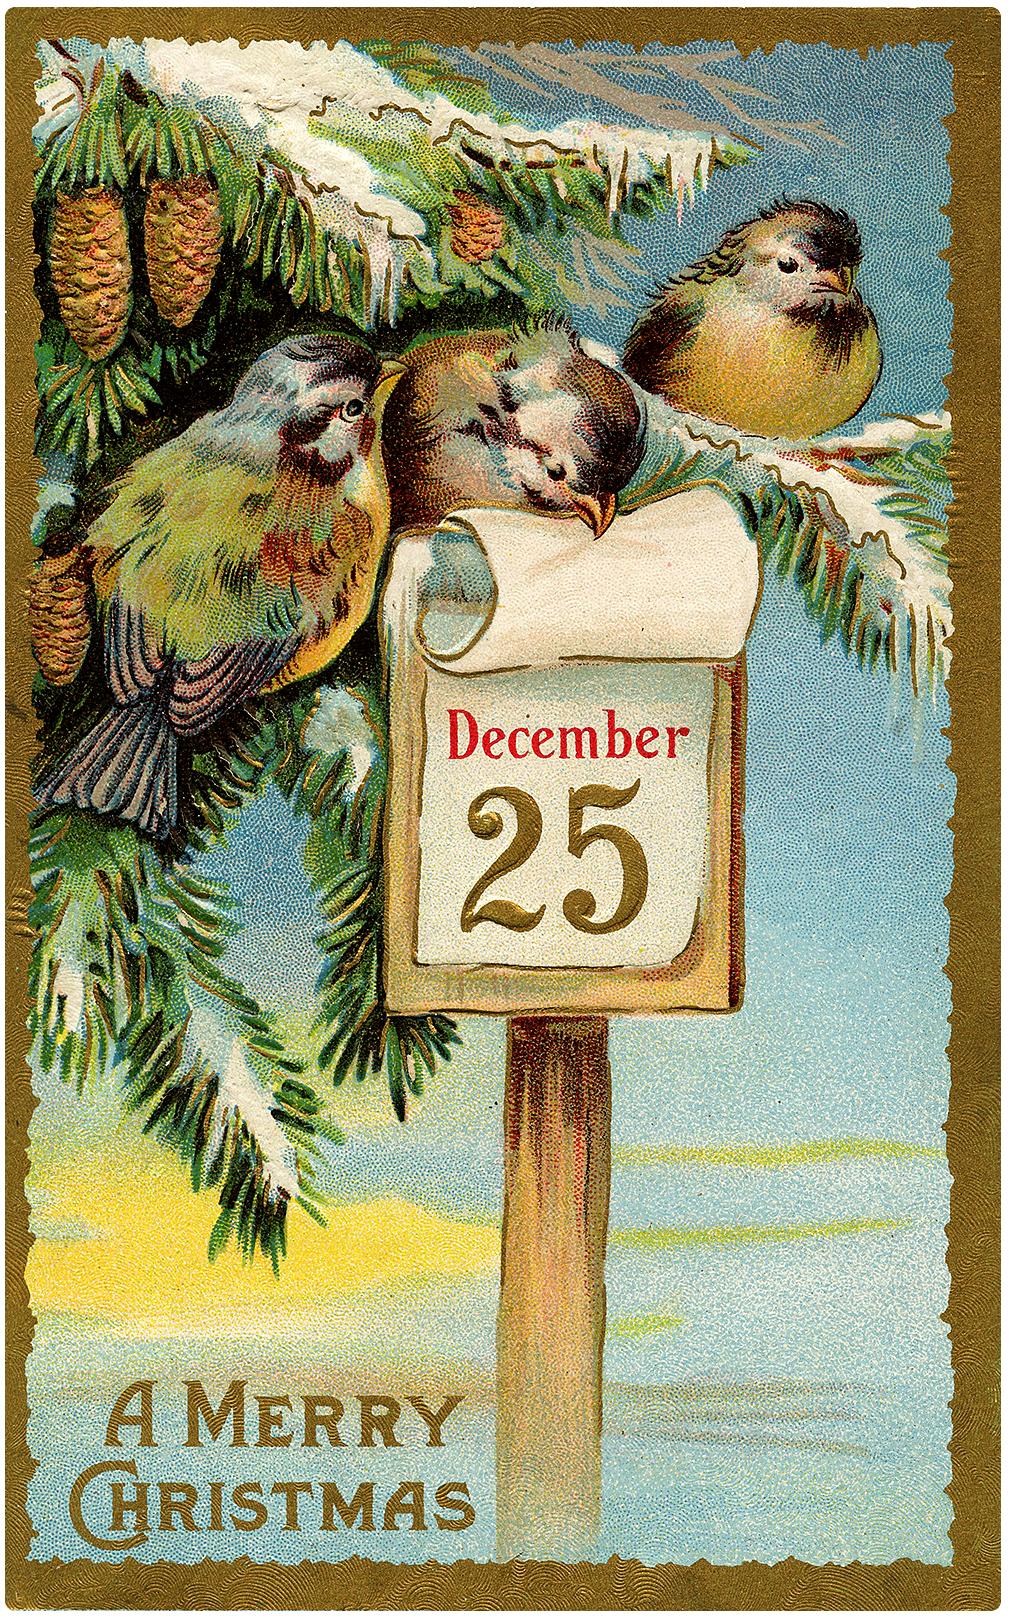 Nostalgic Little Birds with Christmas Calendar Postcard!